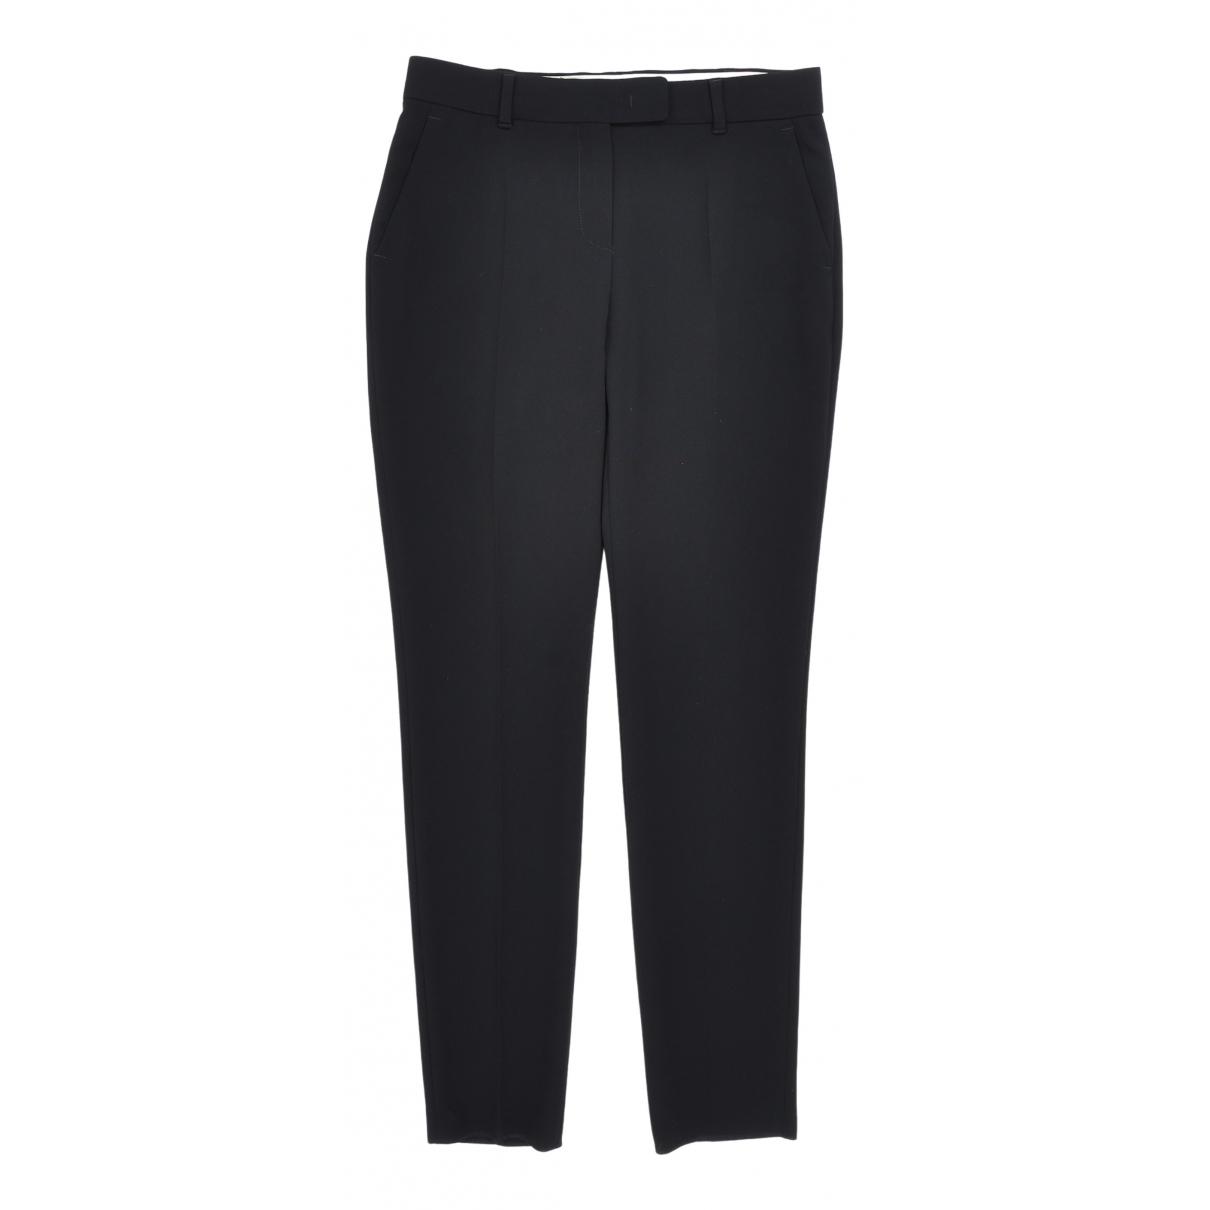 Max Mara N Black Trousers for Women 38 IT